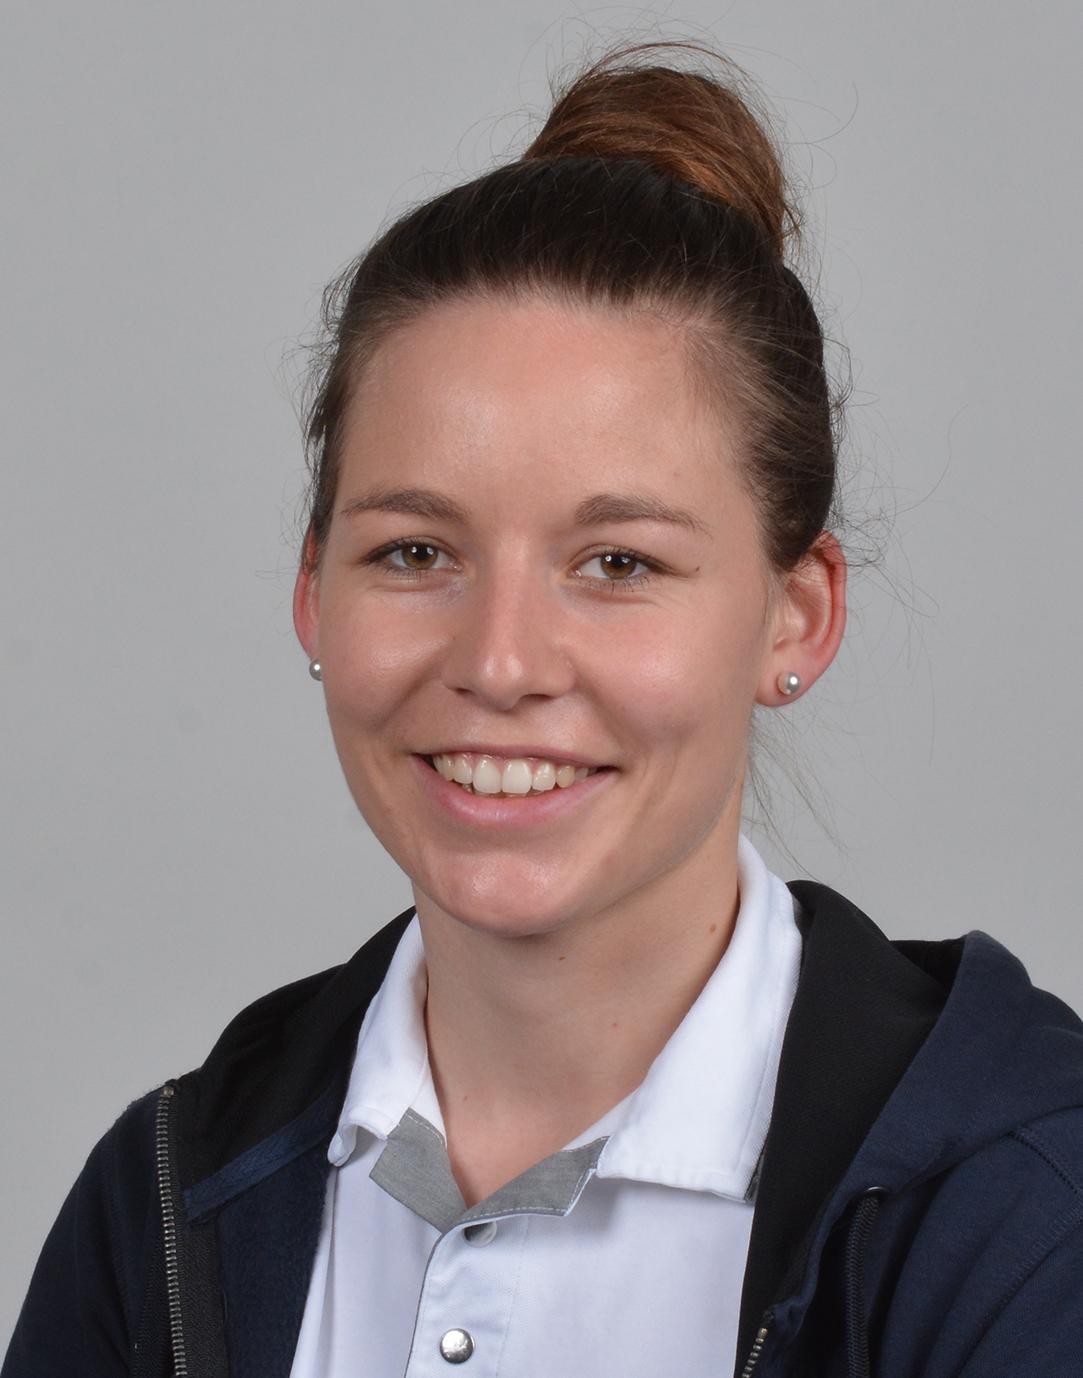 Melanie Bühler, medizinische Praxisassistentin Sportmedizin Nottwil